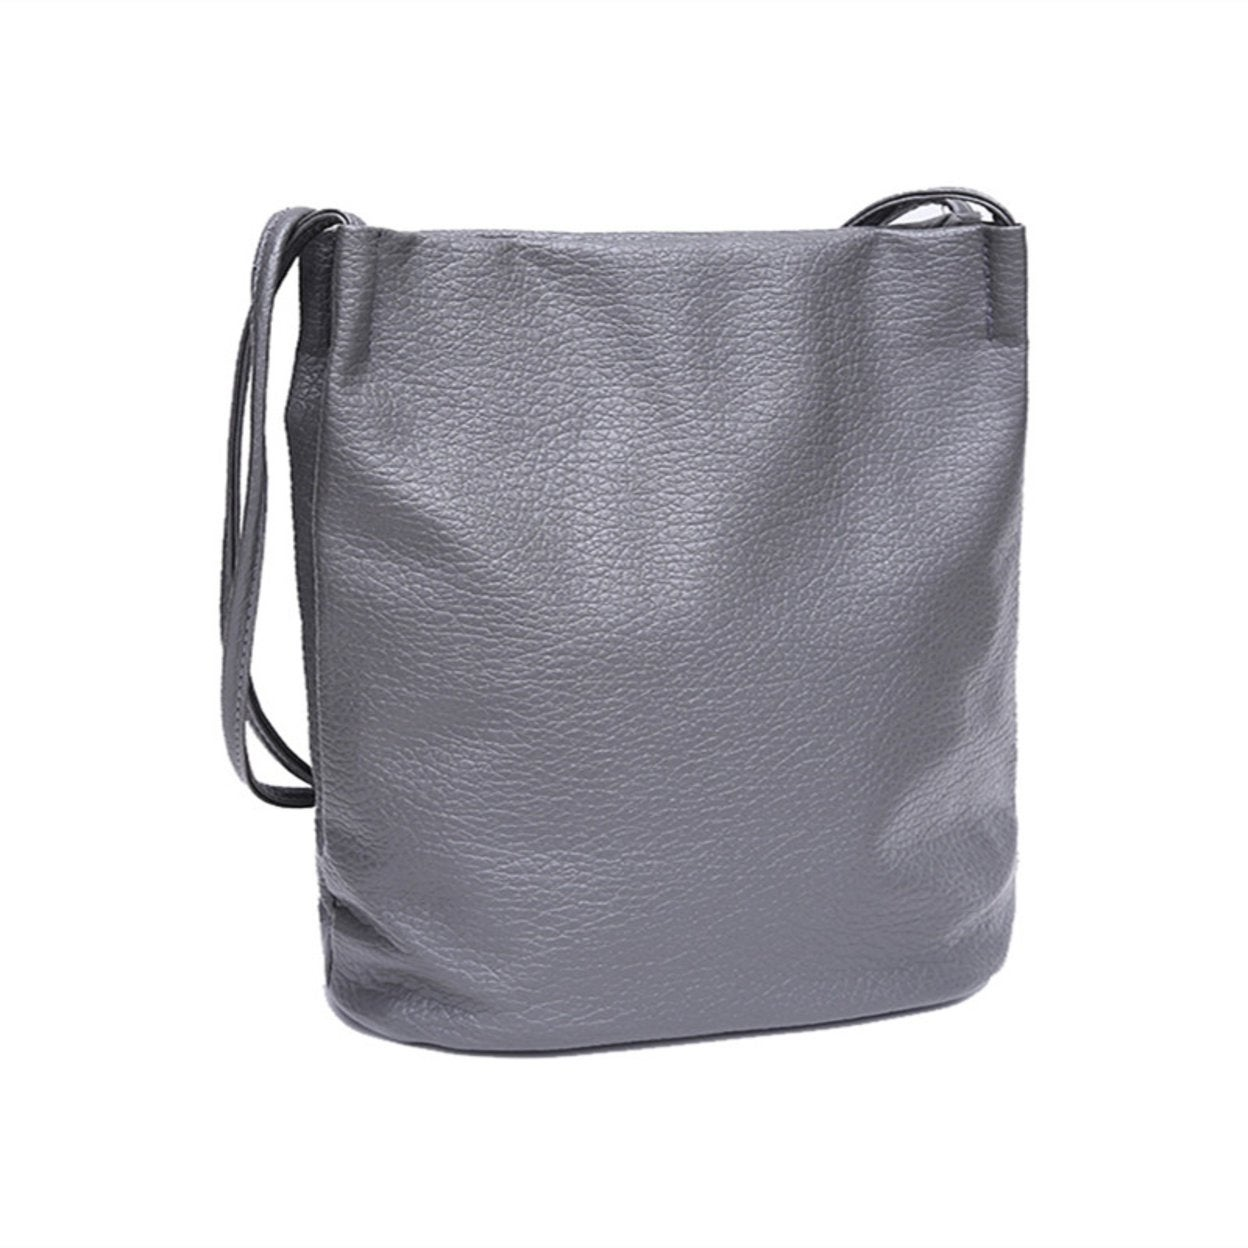 f9123c5d4bc Women Leather Handbags Black Bucket Shoulder Bags Ladies Cross Body Bags